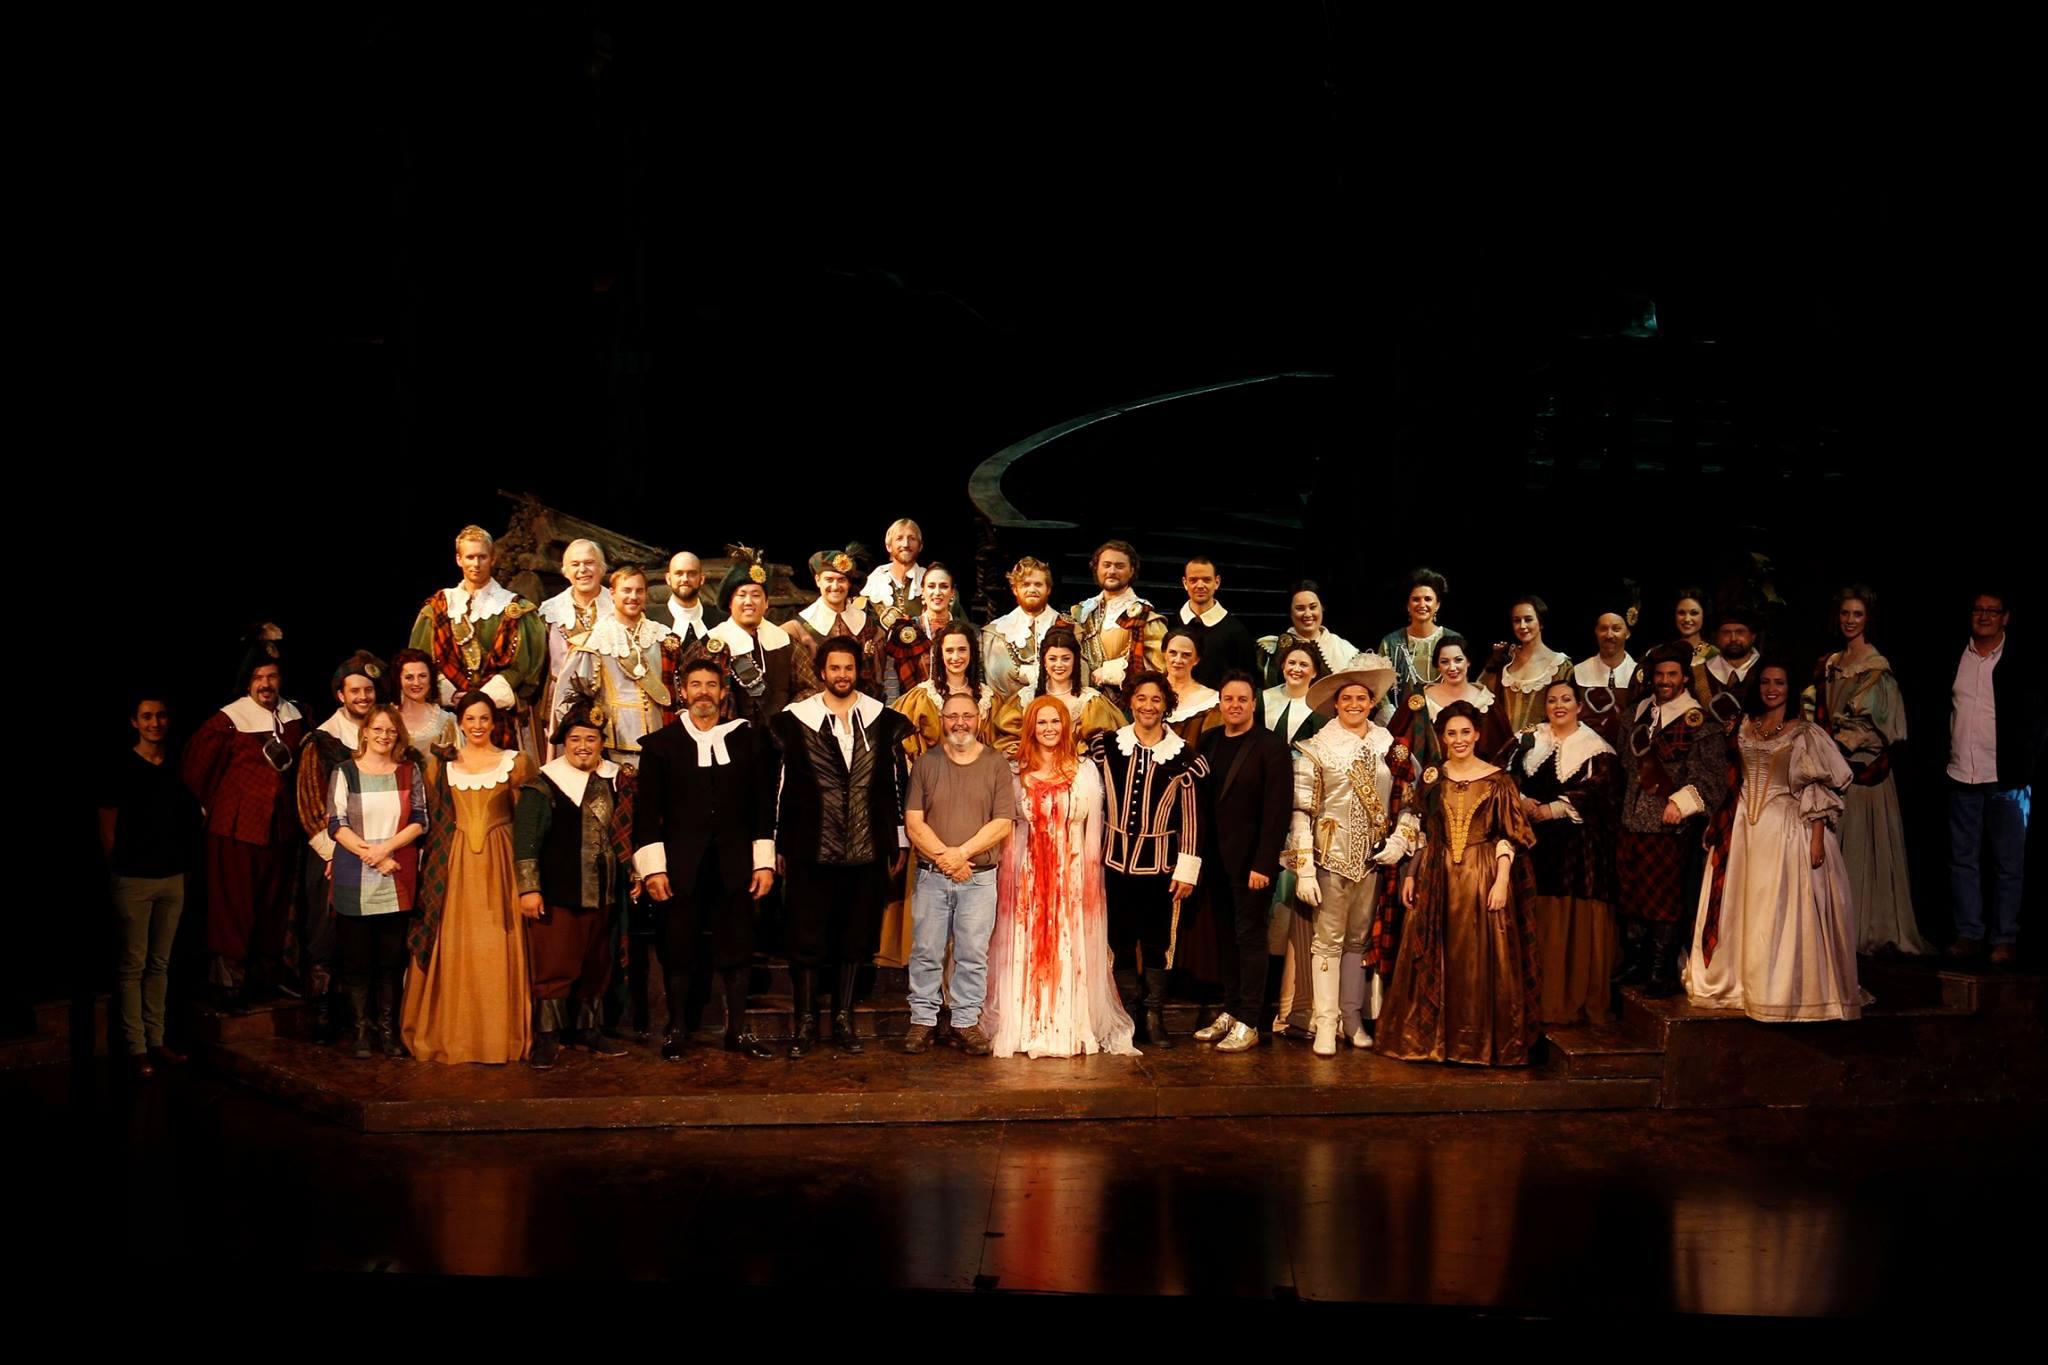 Photo credit: Victorian Opera